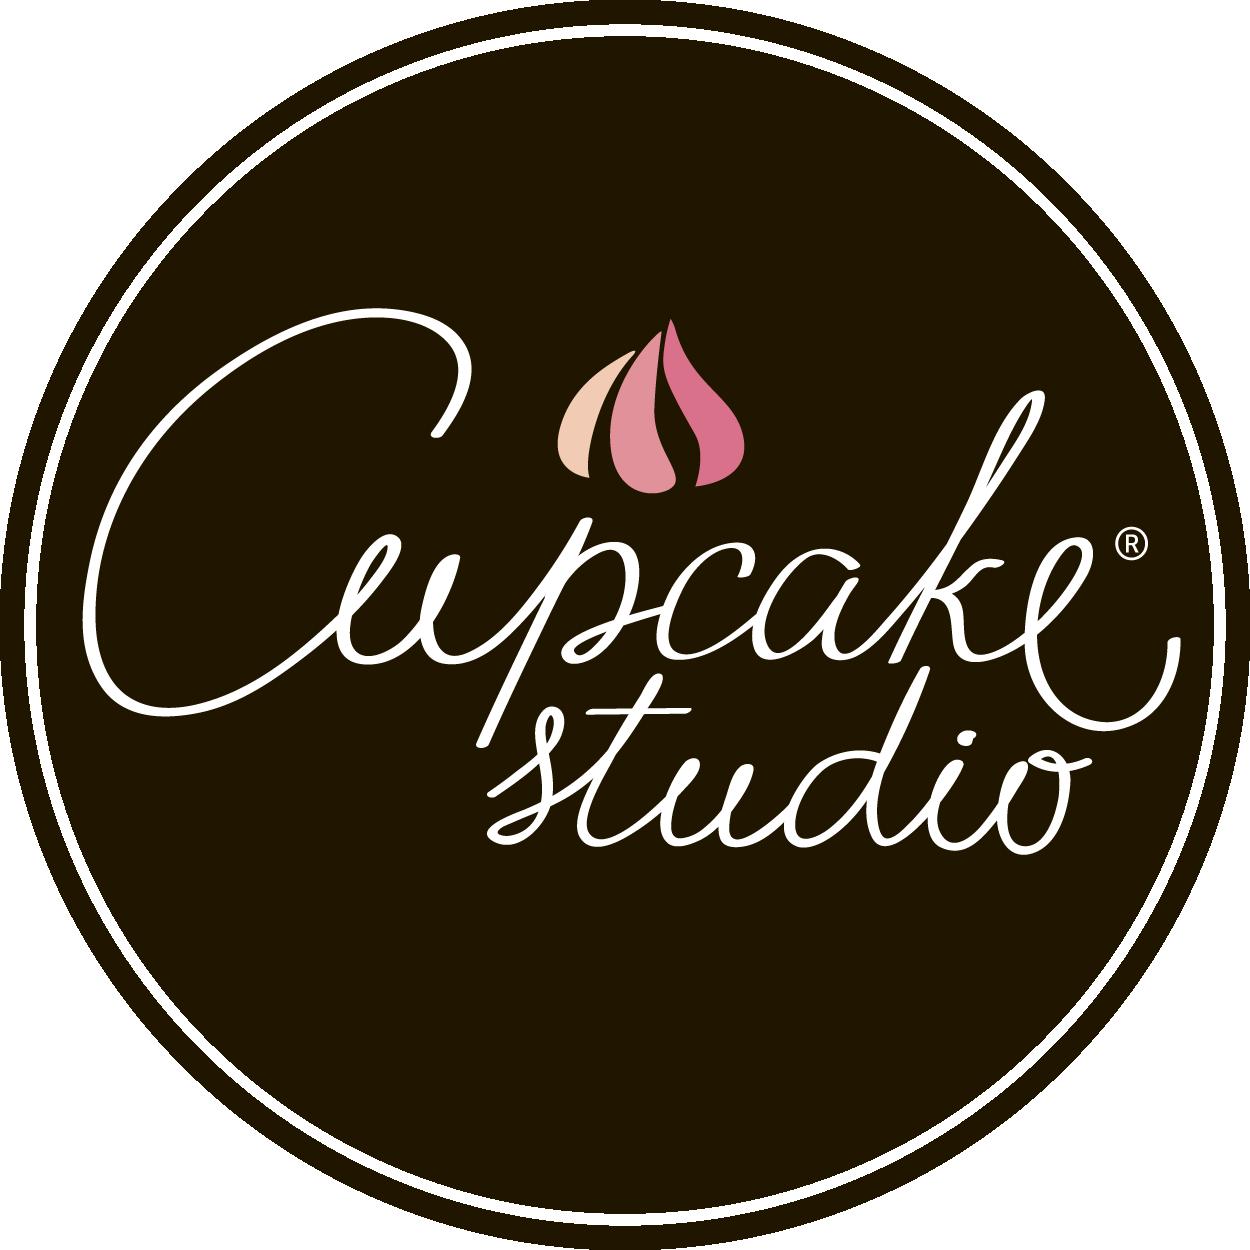 Cupcake studio Kiev